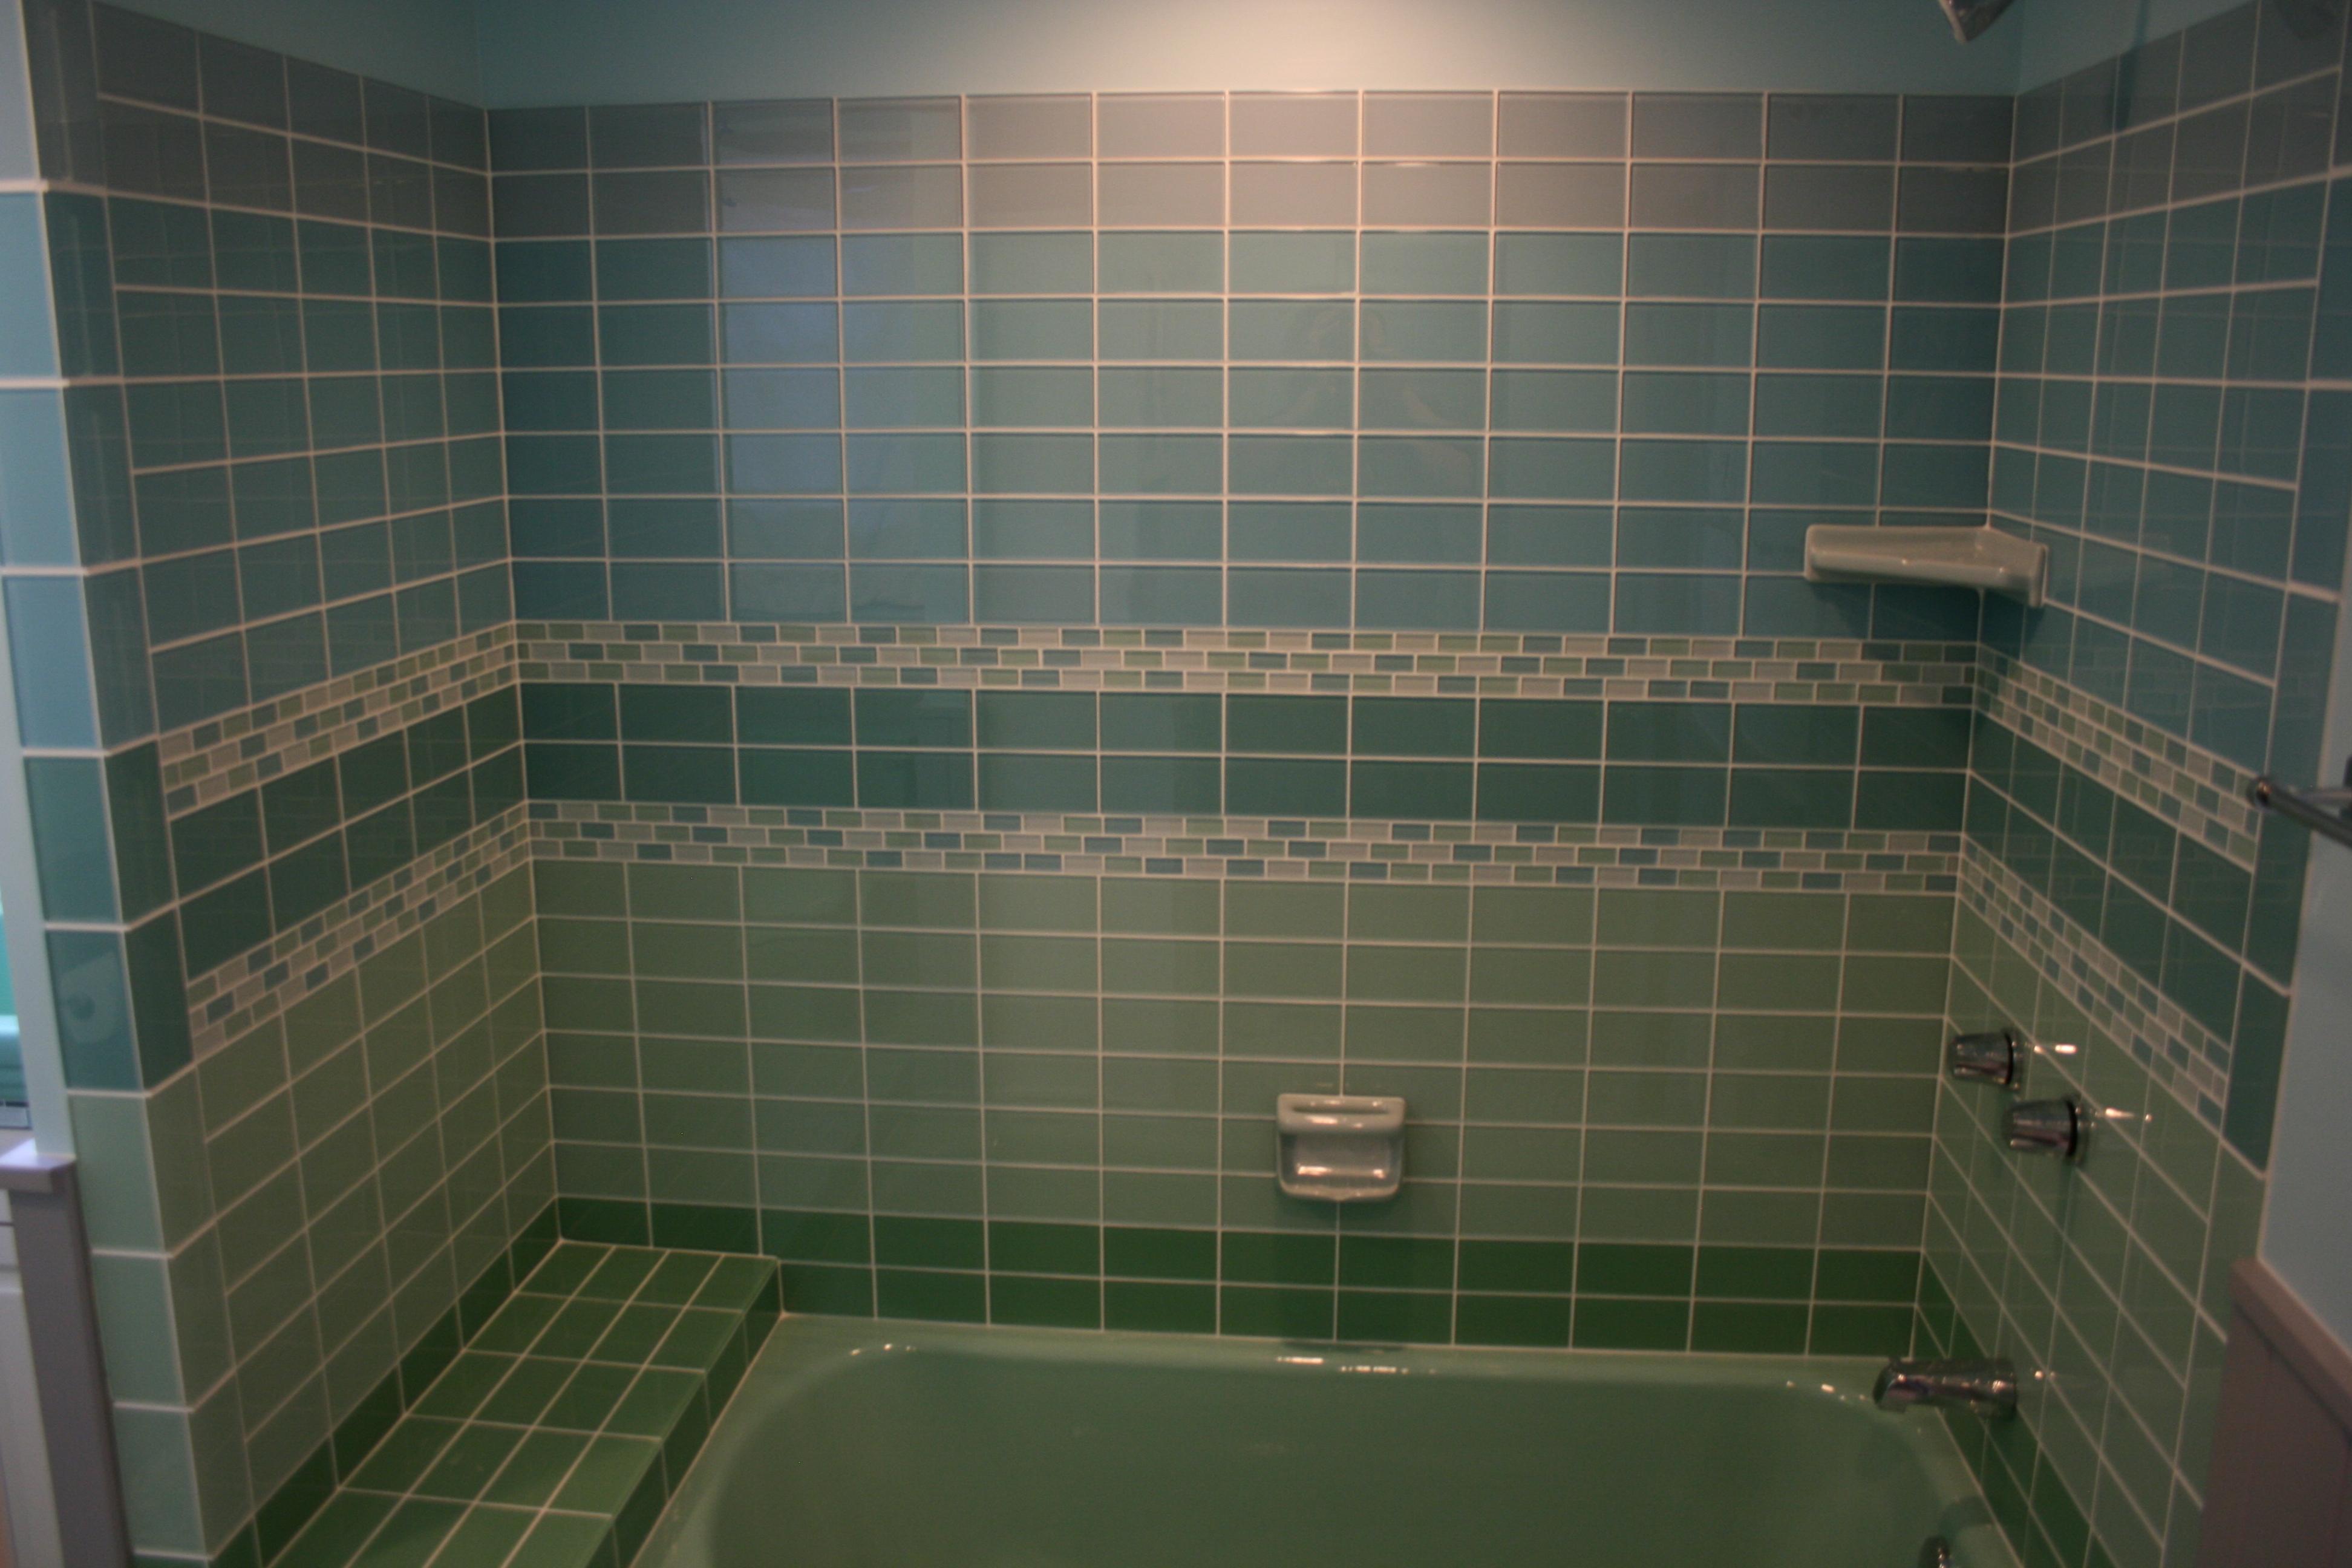 cute tile flooring for bathroom pattern-Contemporary Tile Flooring for Bathroom Plan